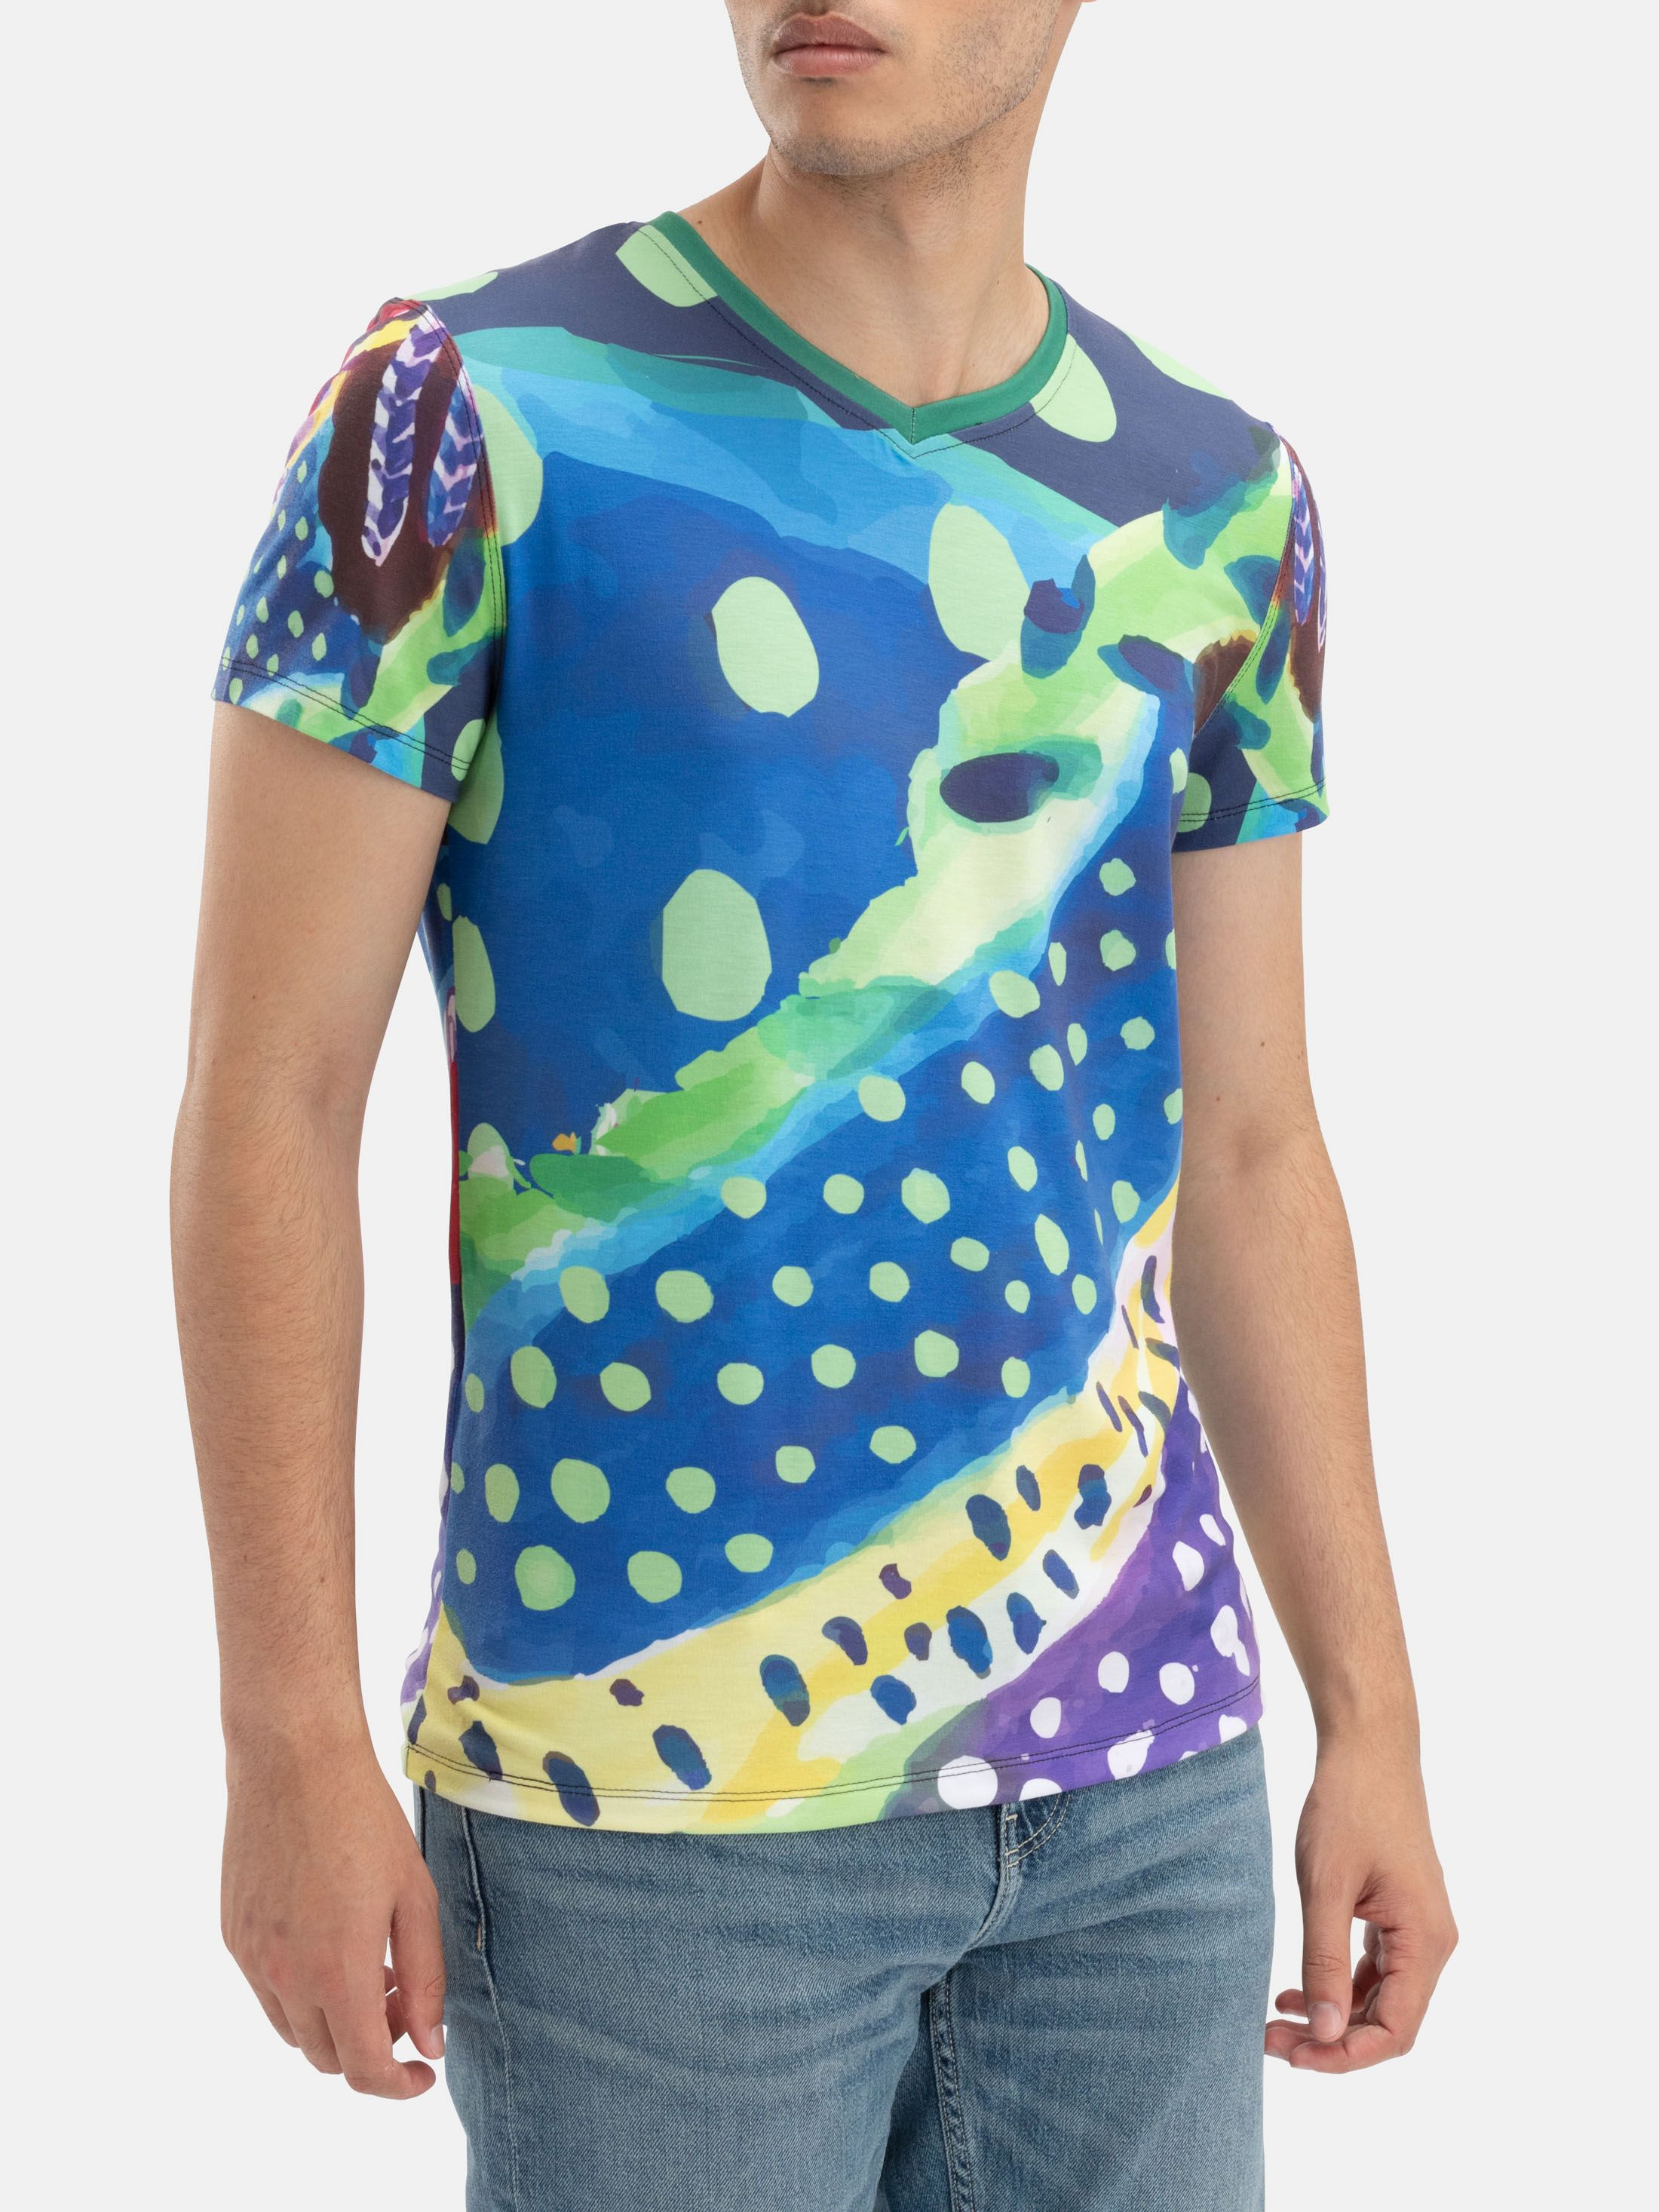 Men's Eco-Friendly T-Shirt Printing